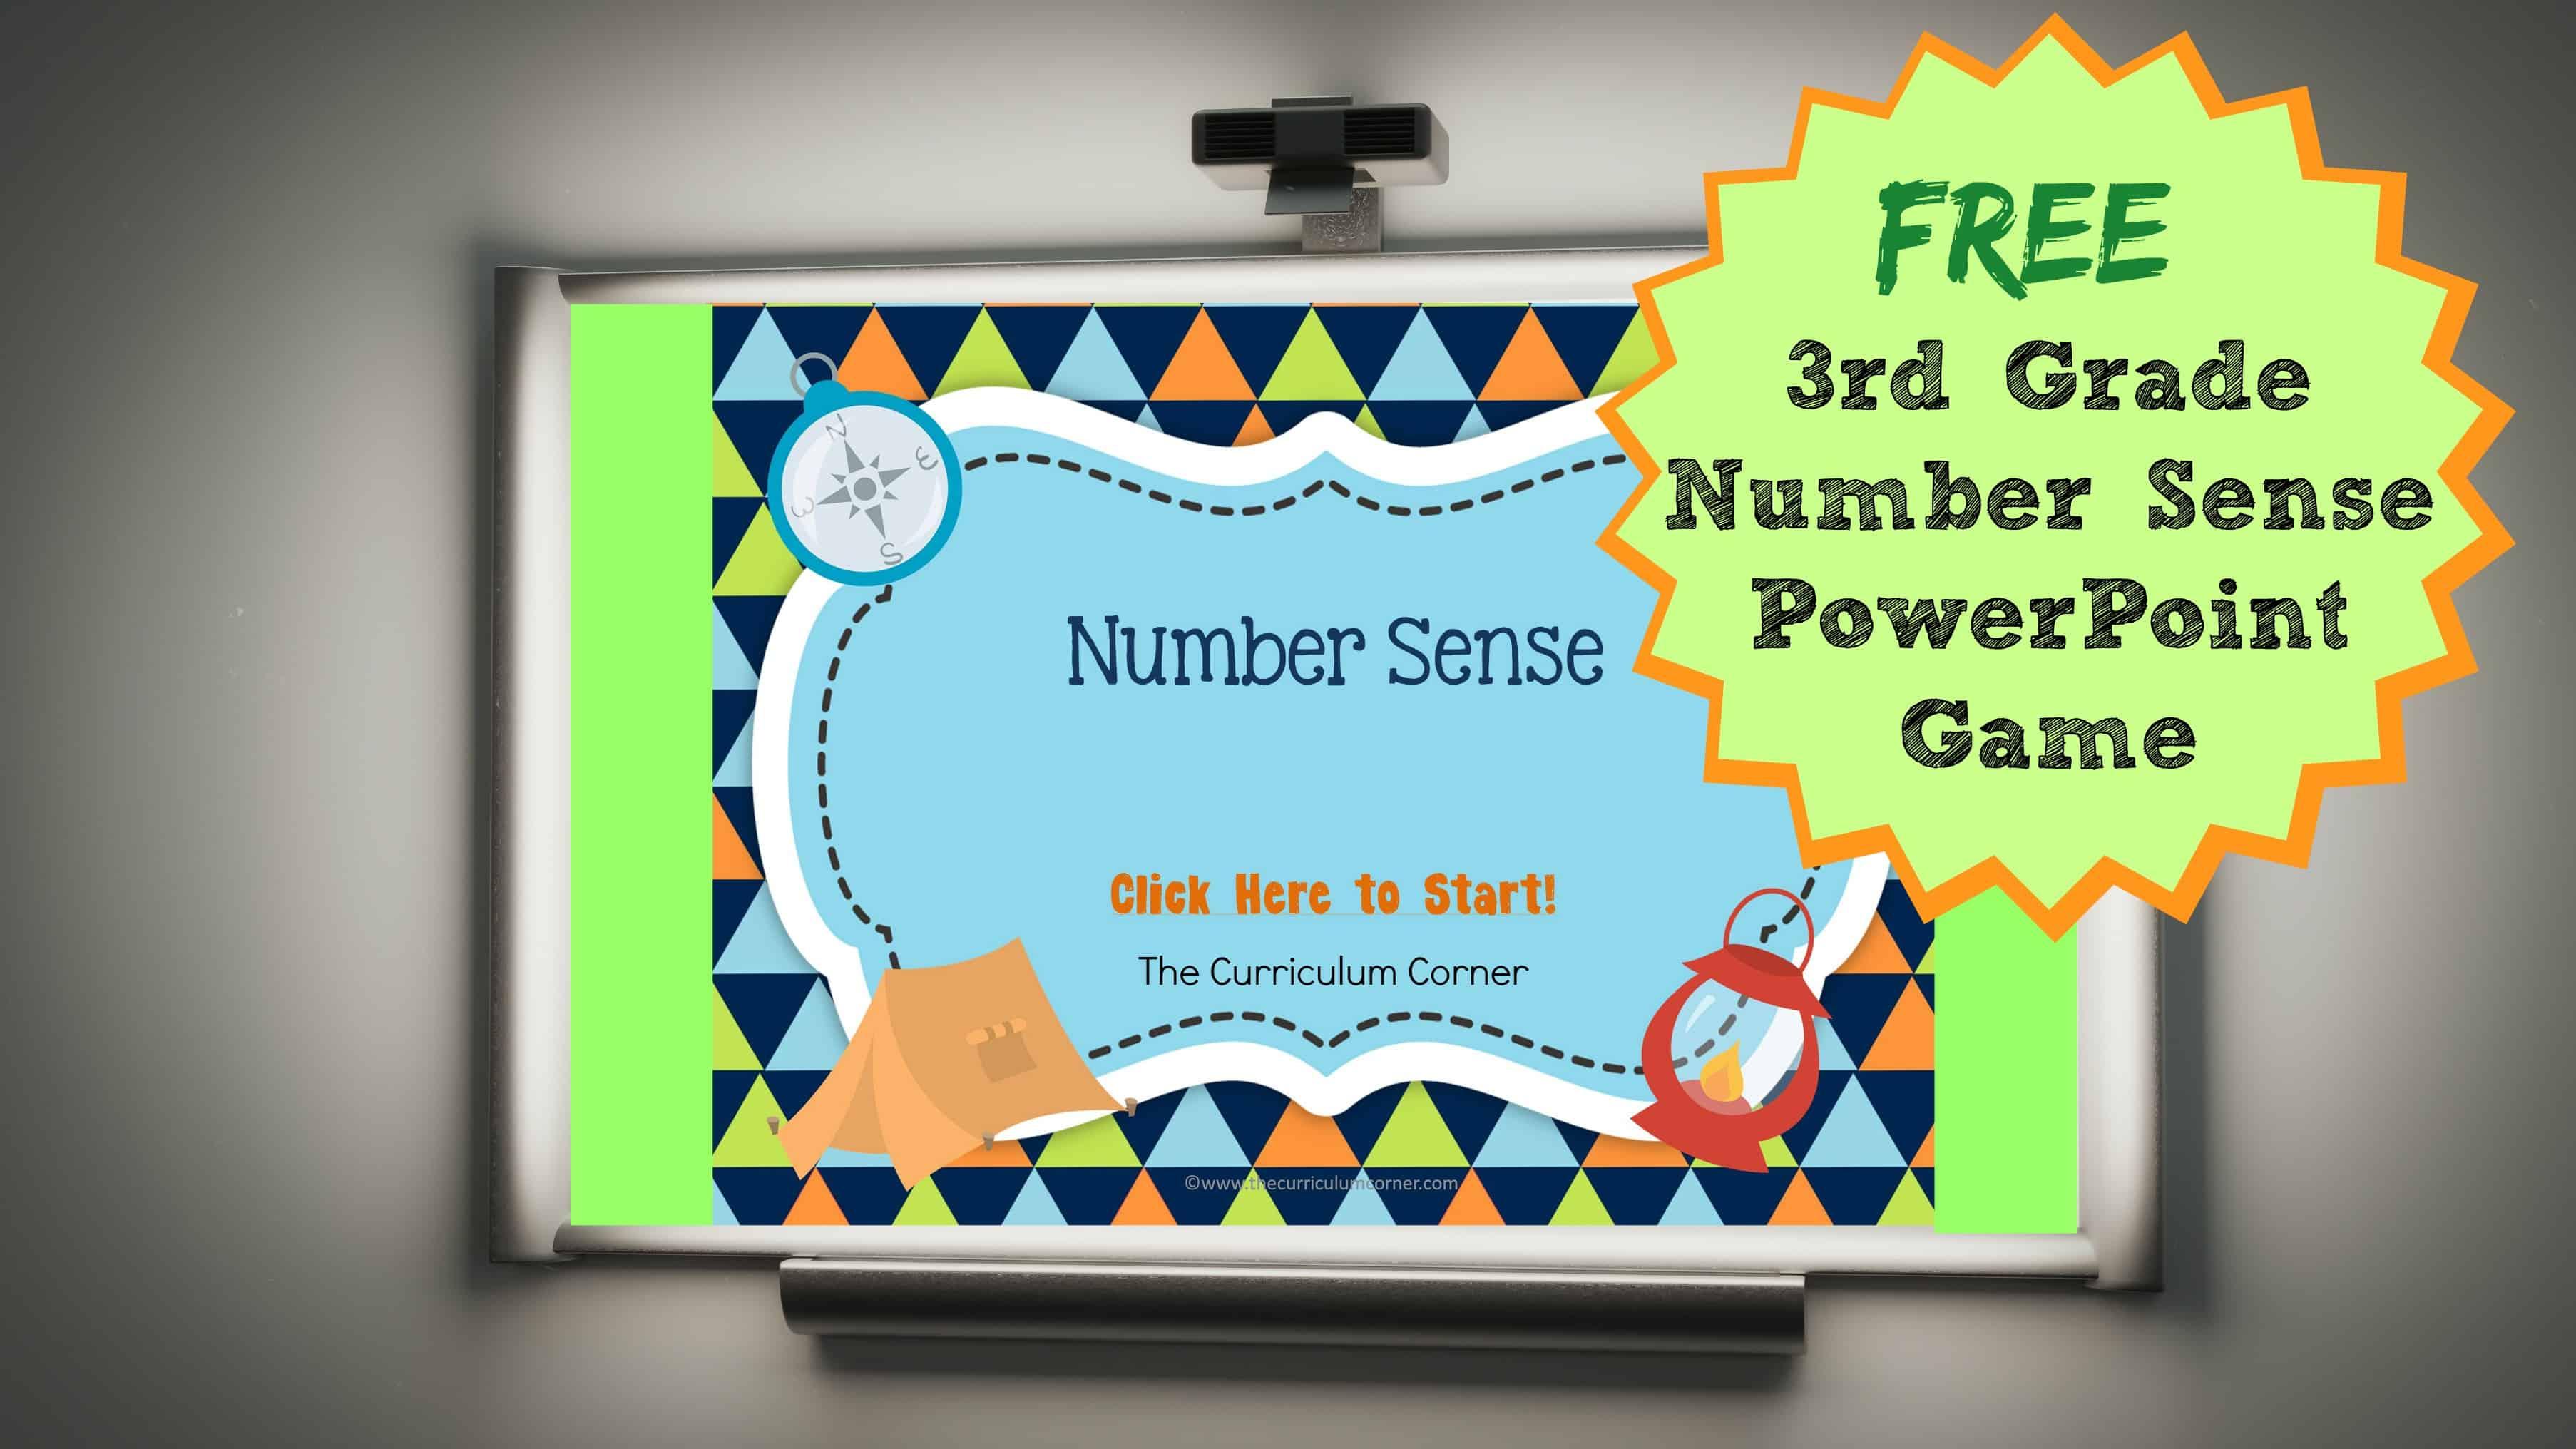 3rd Grade Number Sense PowerPoint Game